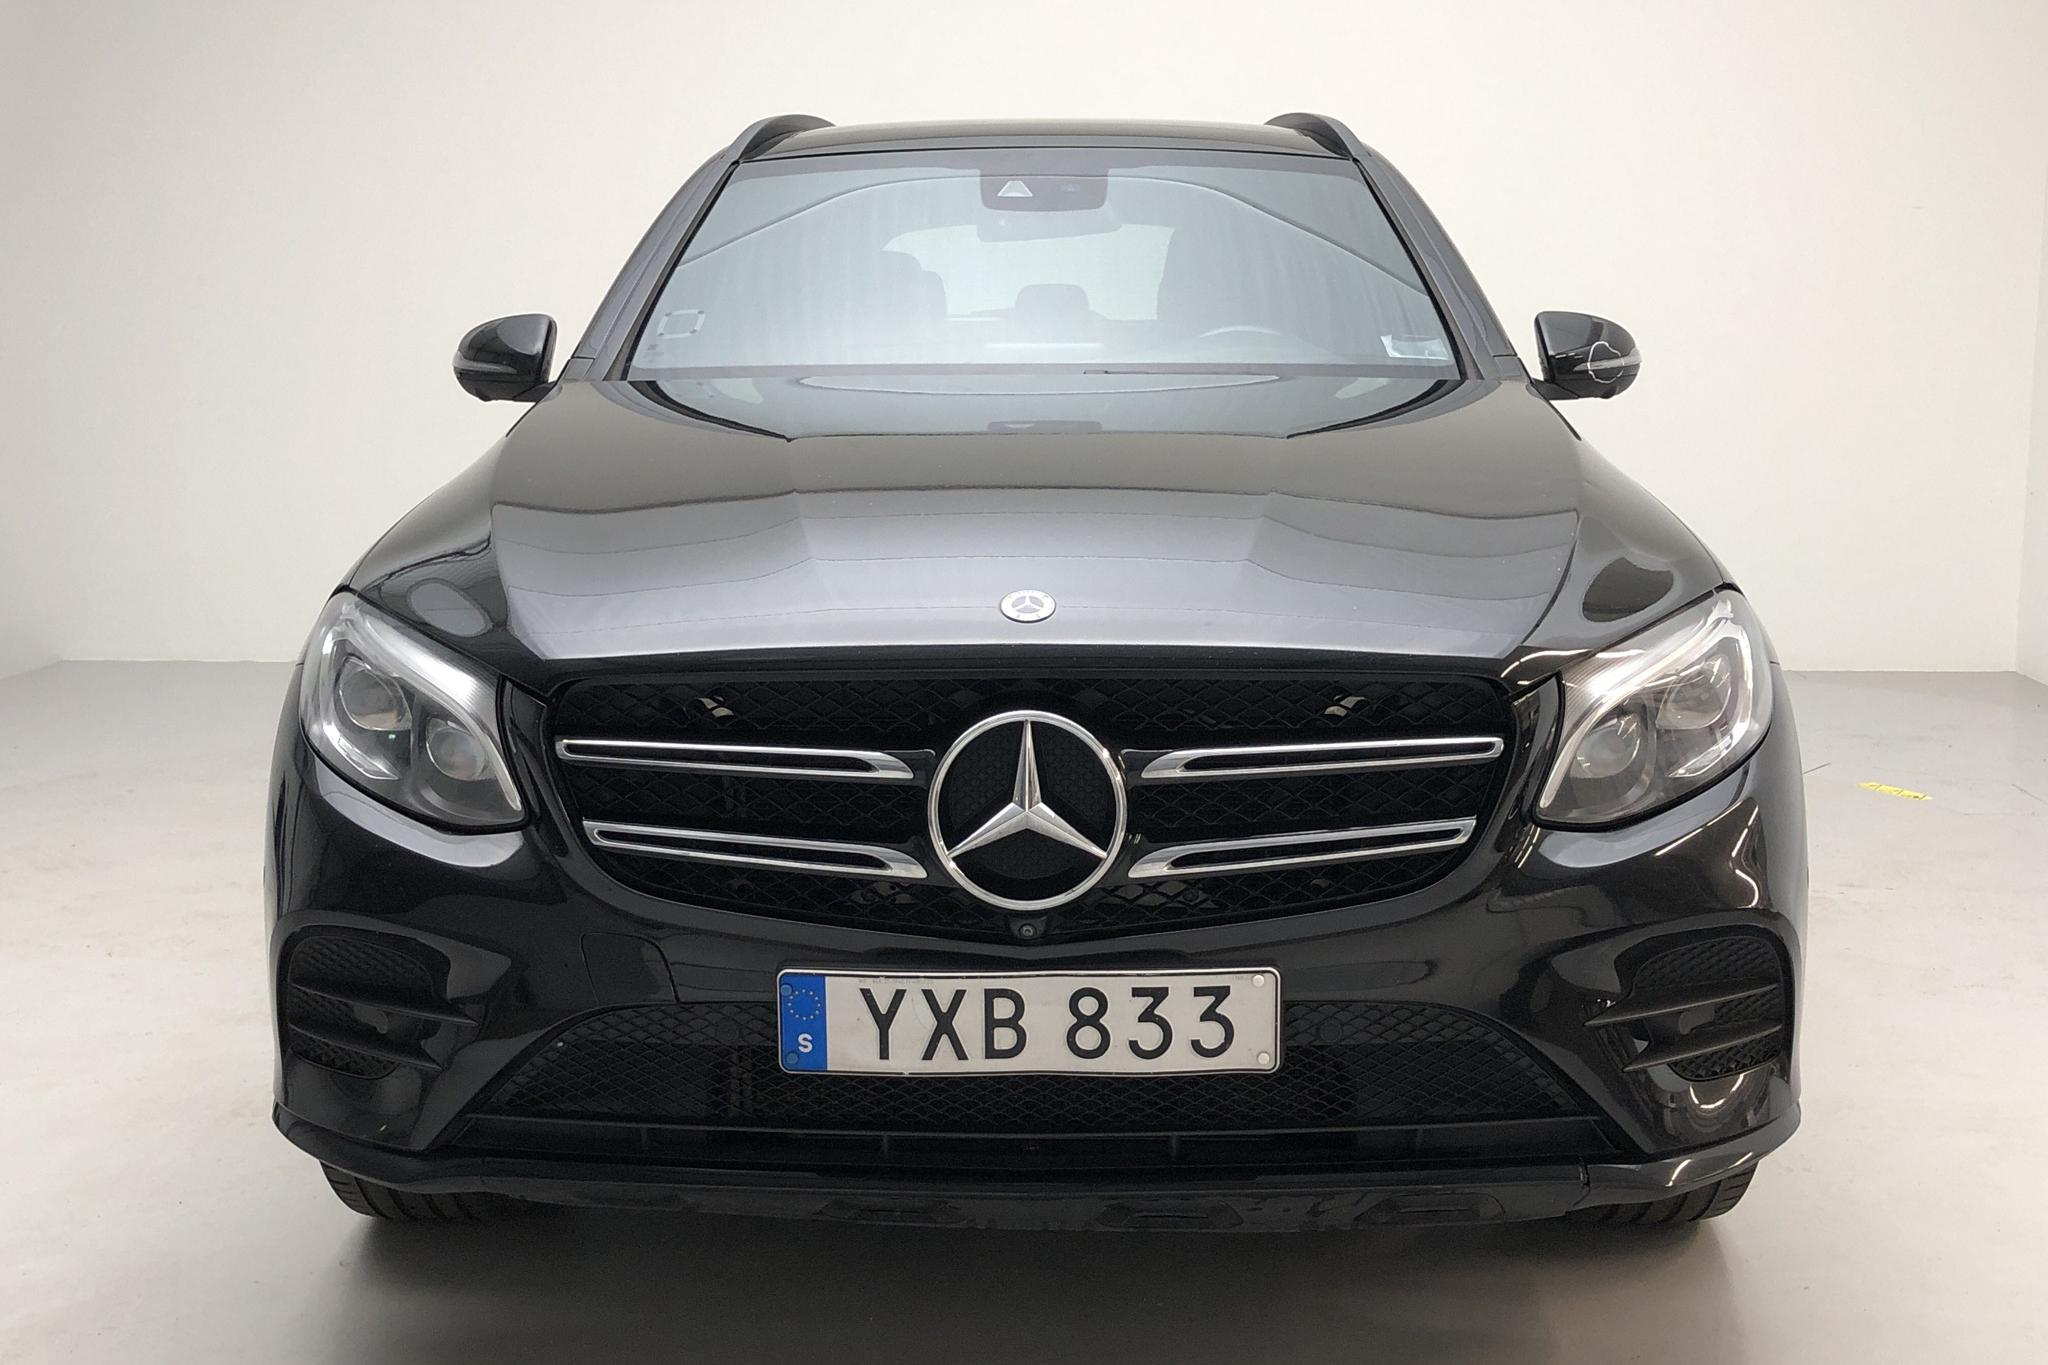 Mercedes GLC 250 4MATIC X253 (211hk) - 71 720 km - Manual - black - 2018